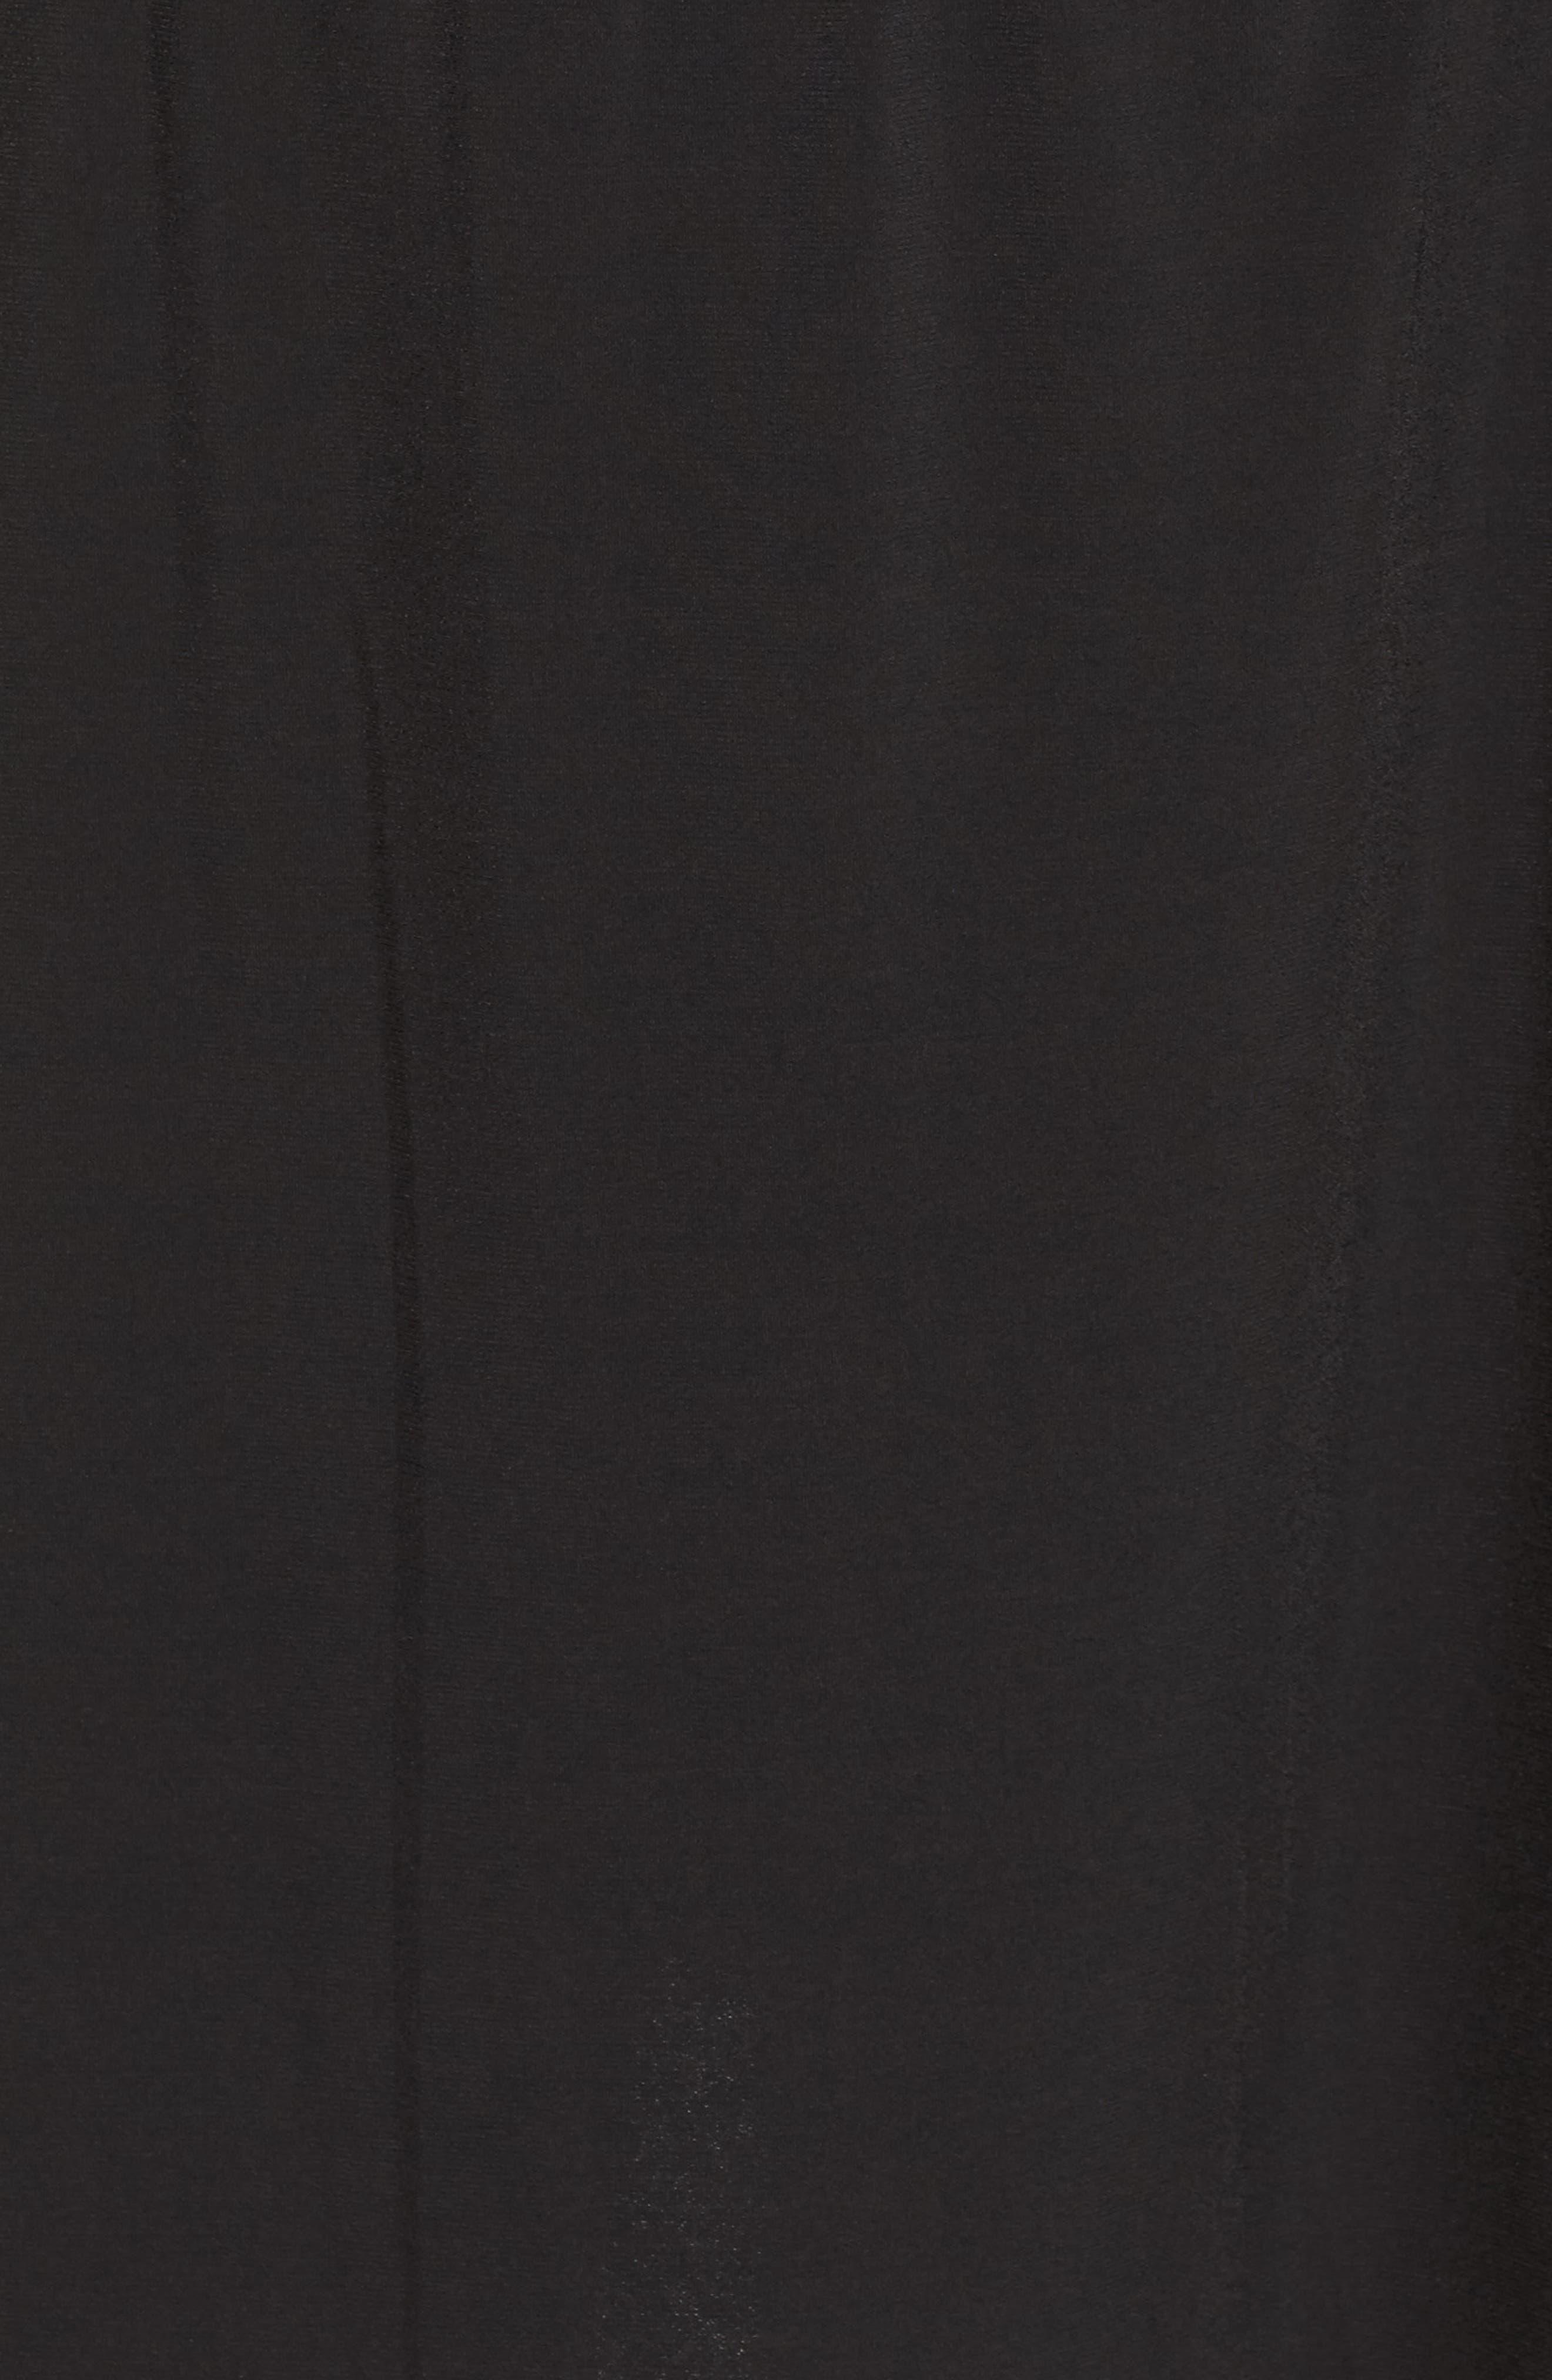 Cold Shoulder A-Line Jersey Dress,                             Alternate thumbnail 5, color,                             Black